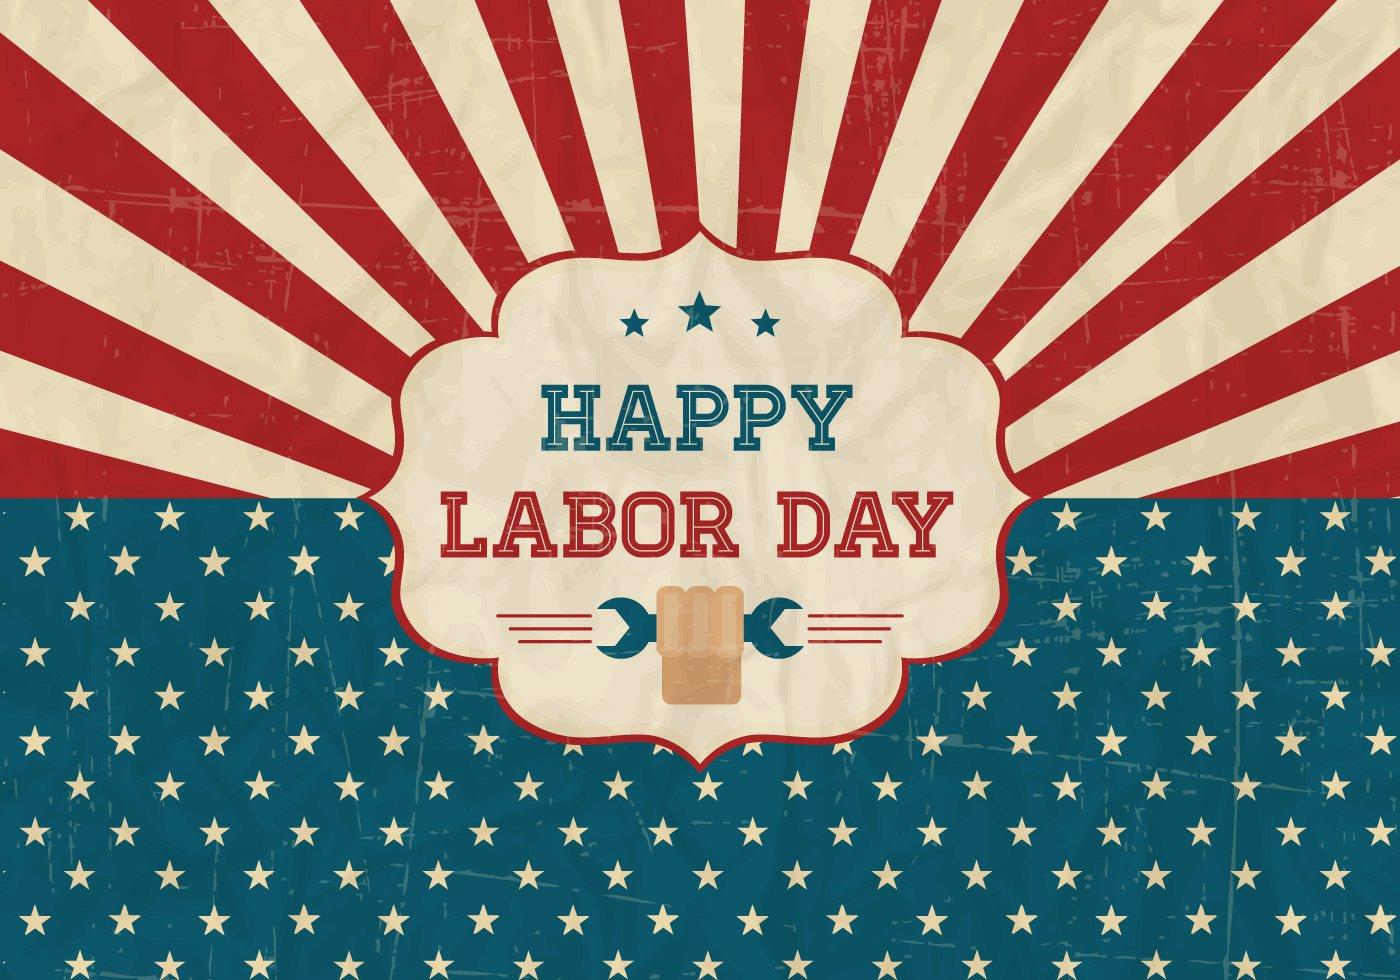 labor day holiday monday - HD1400×980